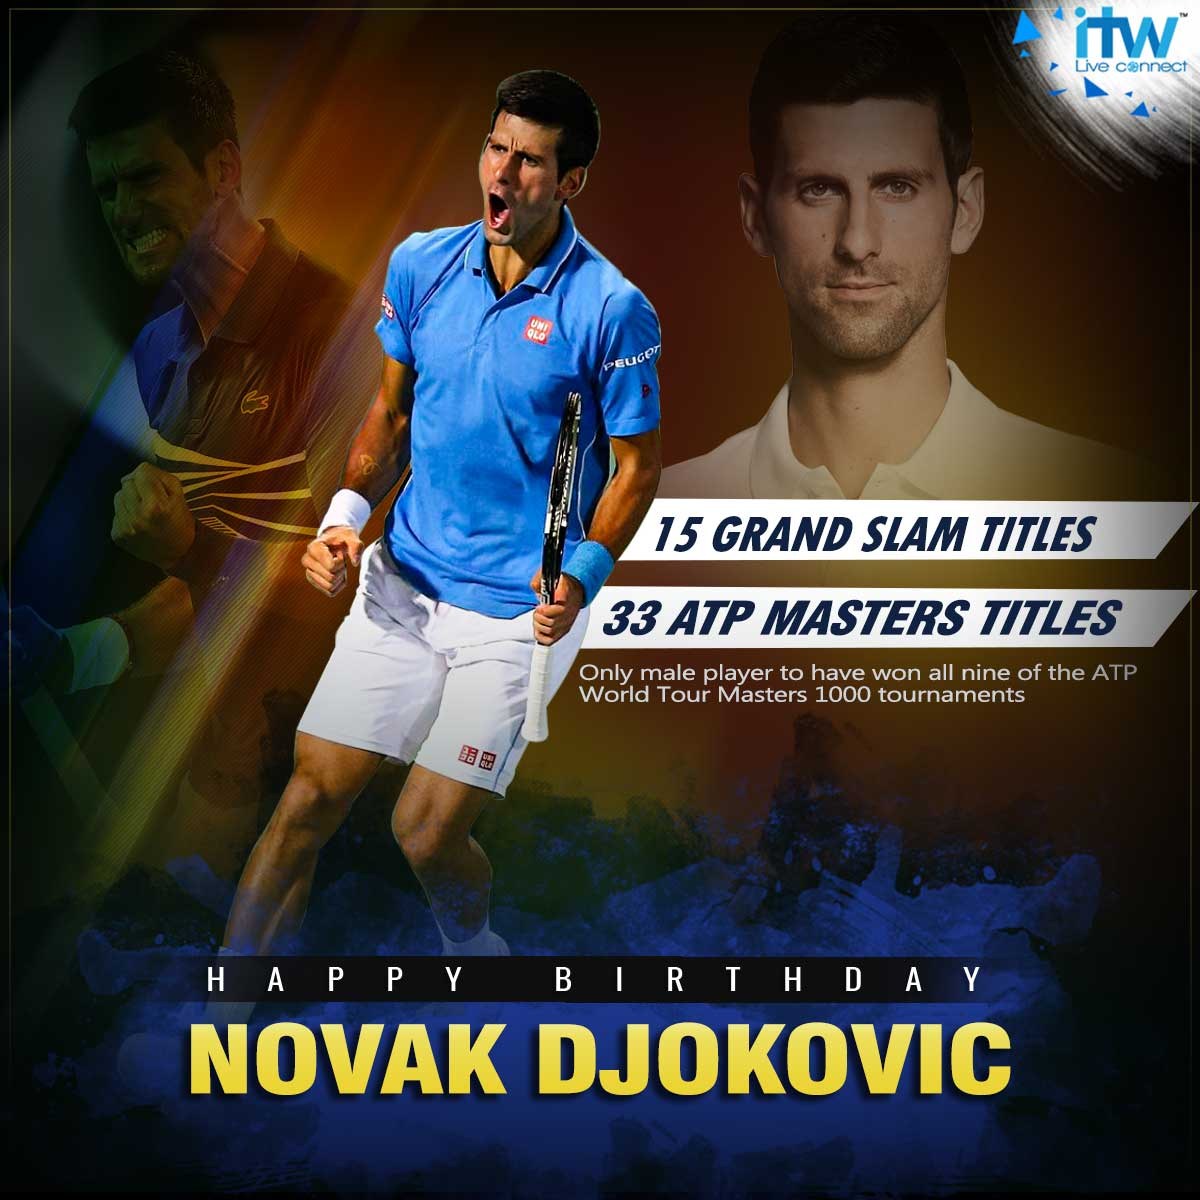 Happy Birthday to World\s tennis player Novak Djokovi Nole!